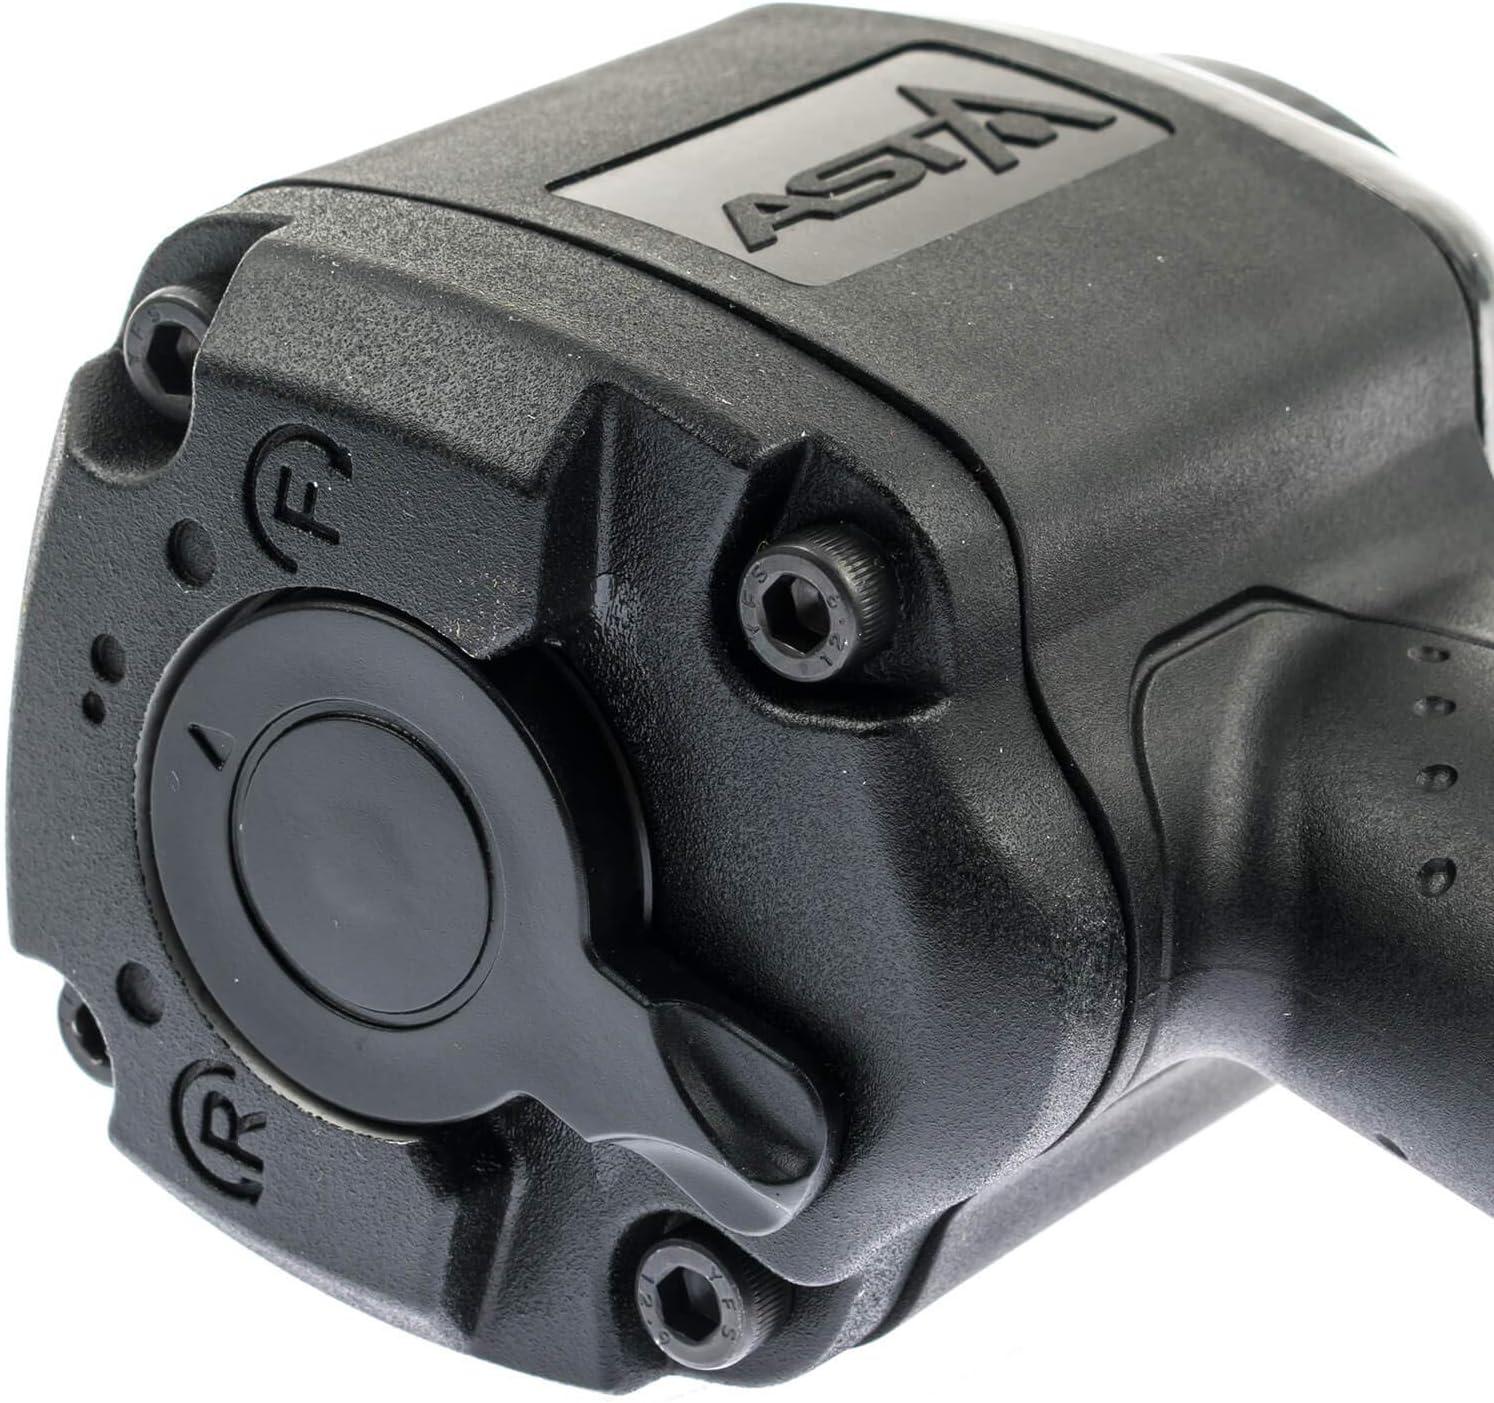 Asta A-SD850 Druckluft Schlagschrauber 1//2 Zoll 850 Nm